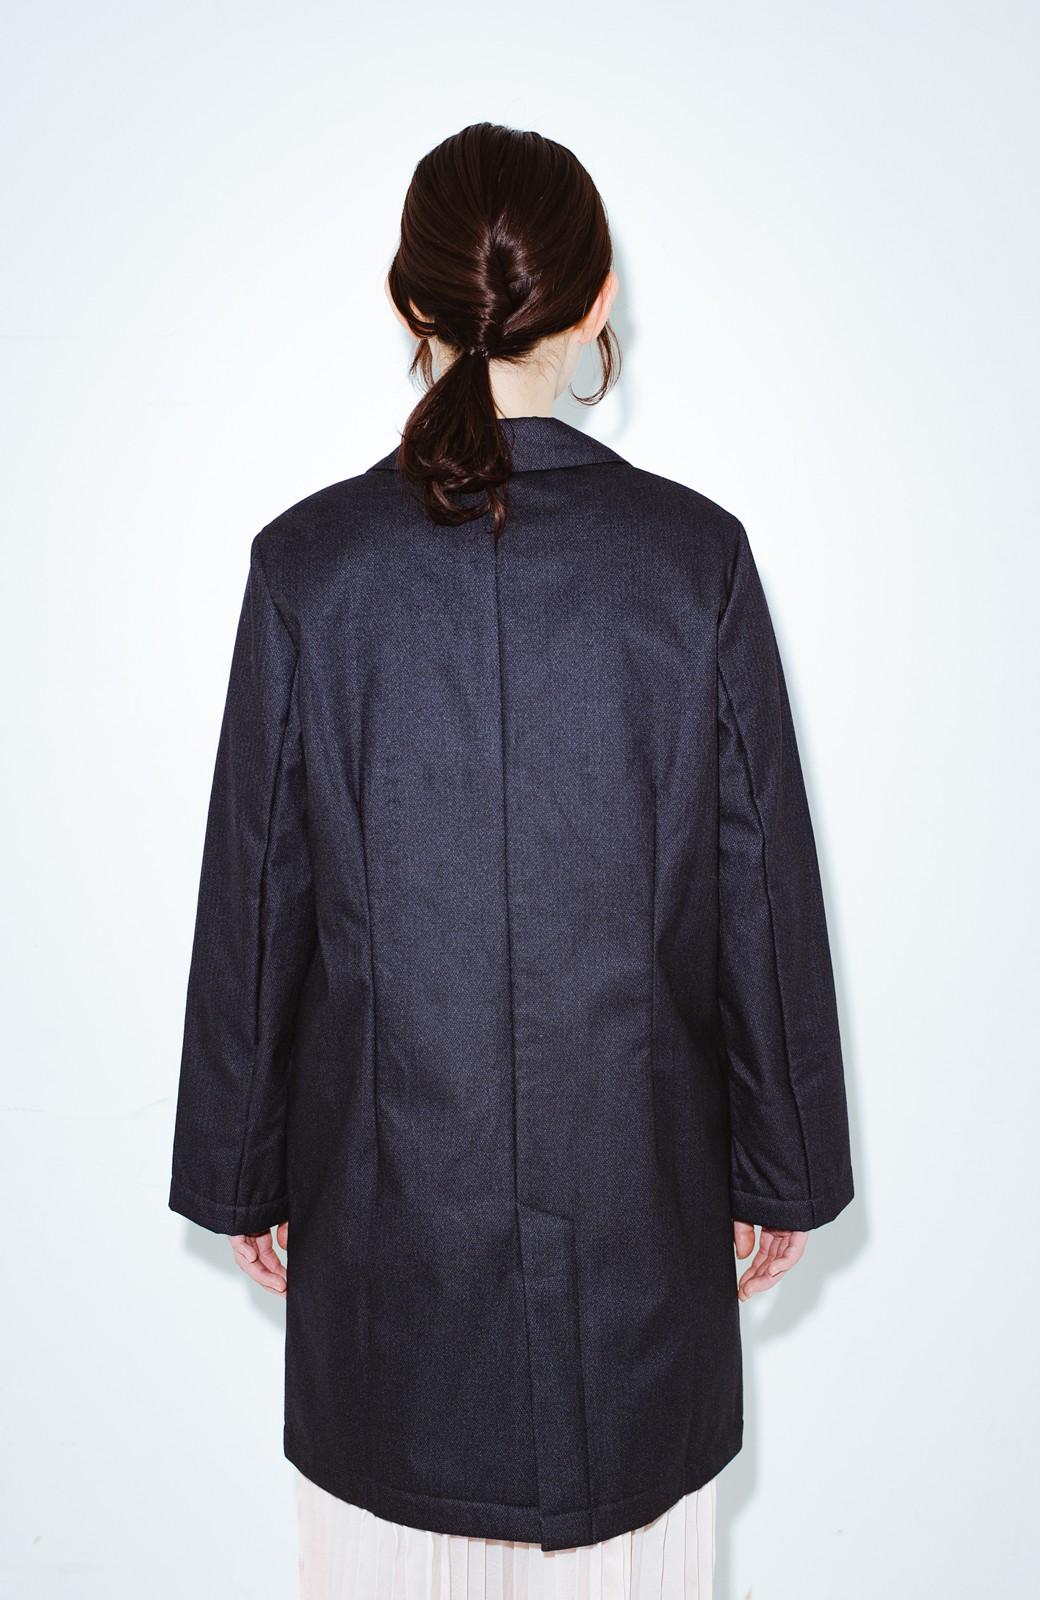 haco! co&tion 二宮佐和子Unicorn&Crystal Coat【アーティスト監修10点もの】 <ブラック>の商品写真12